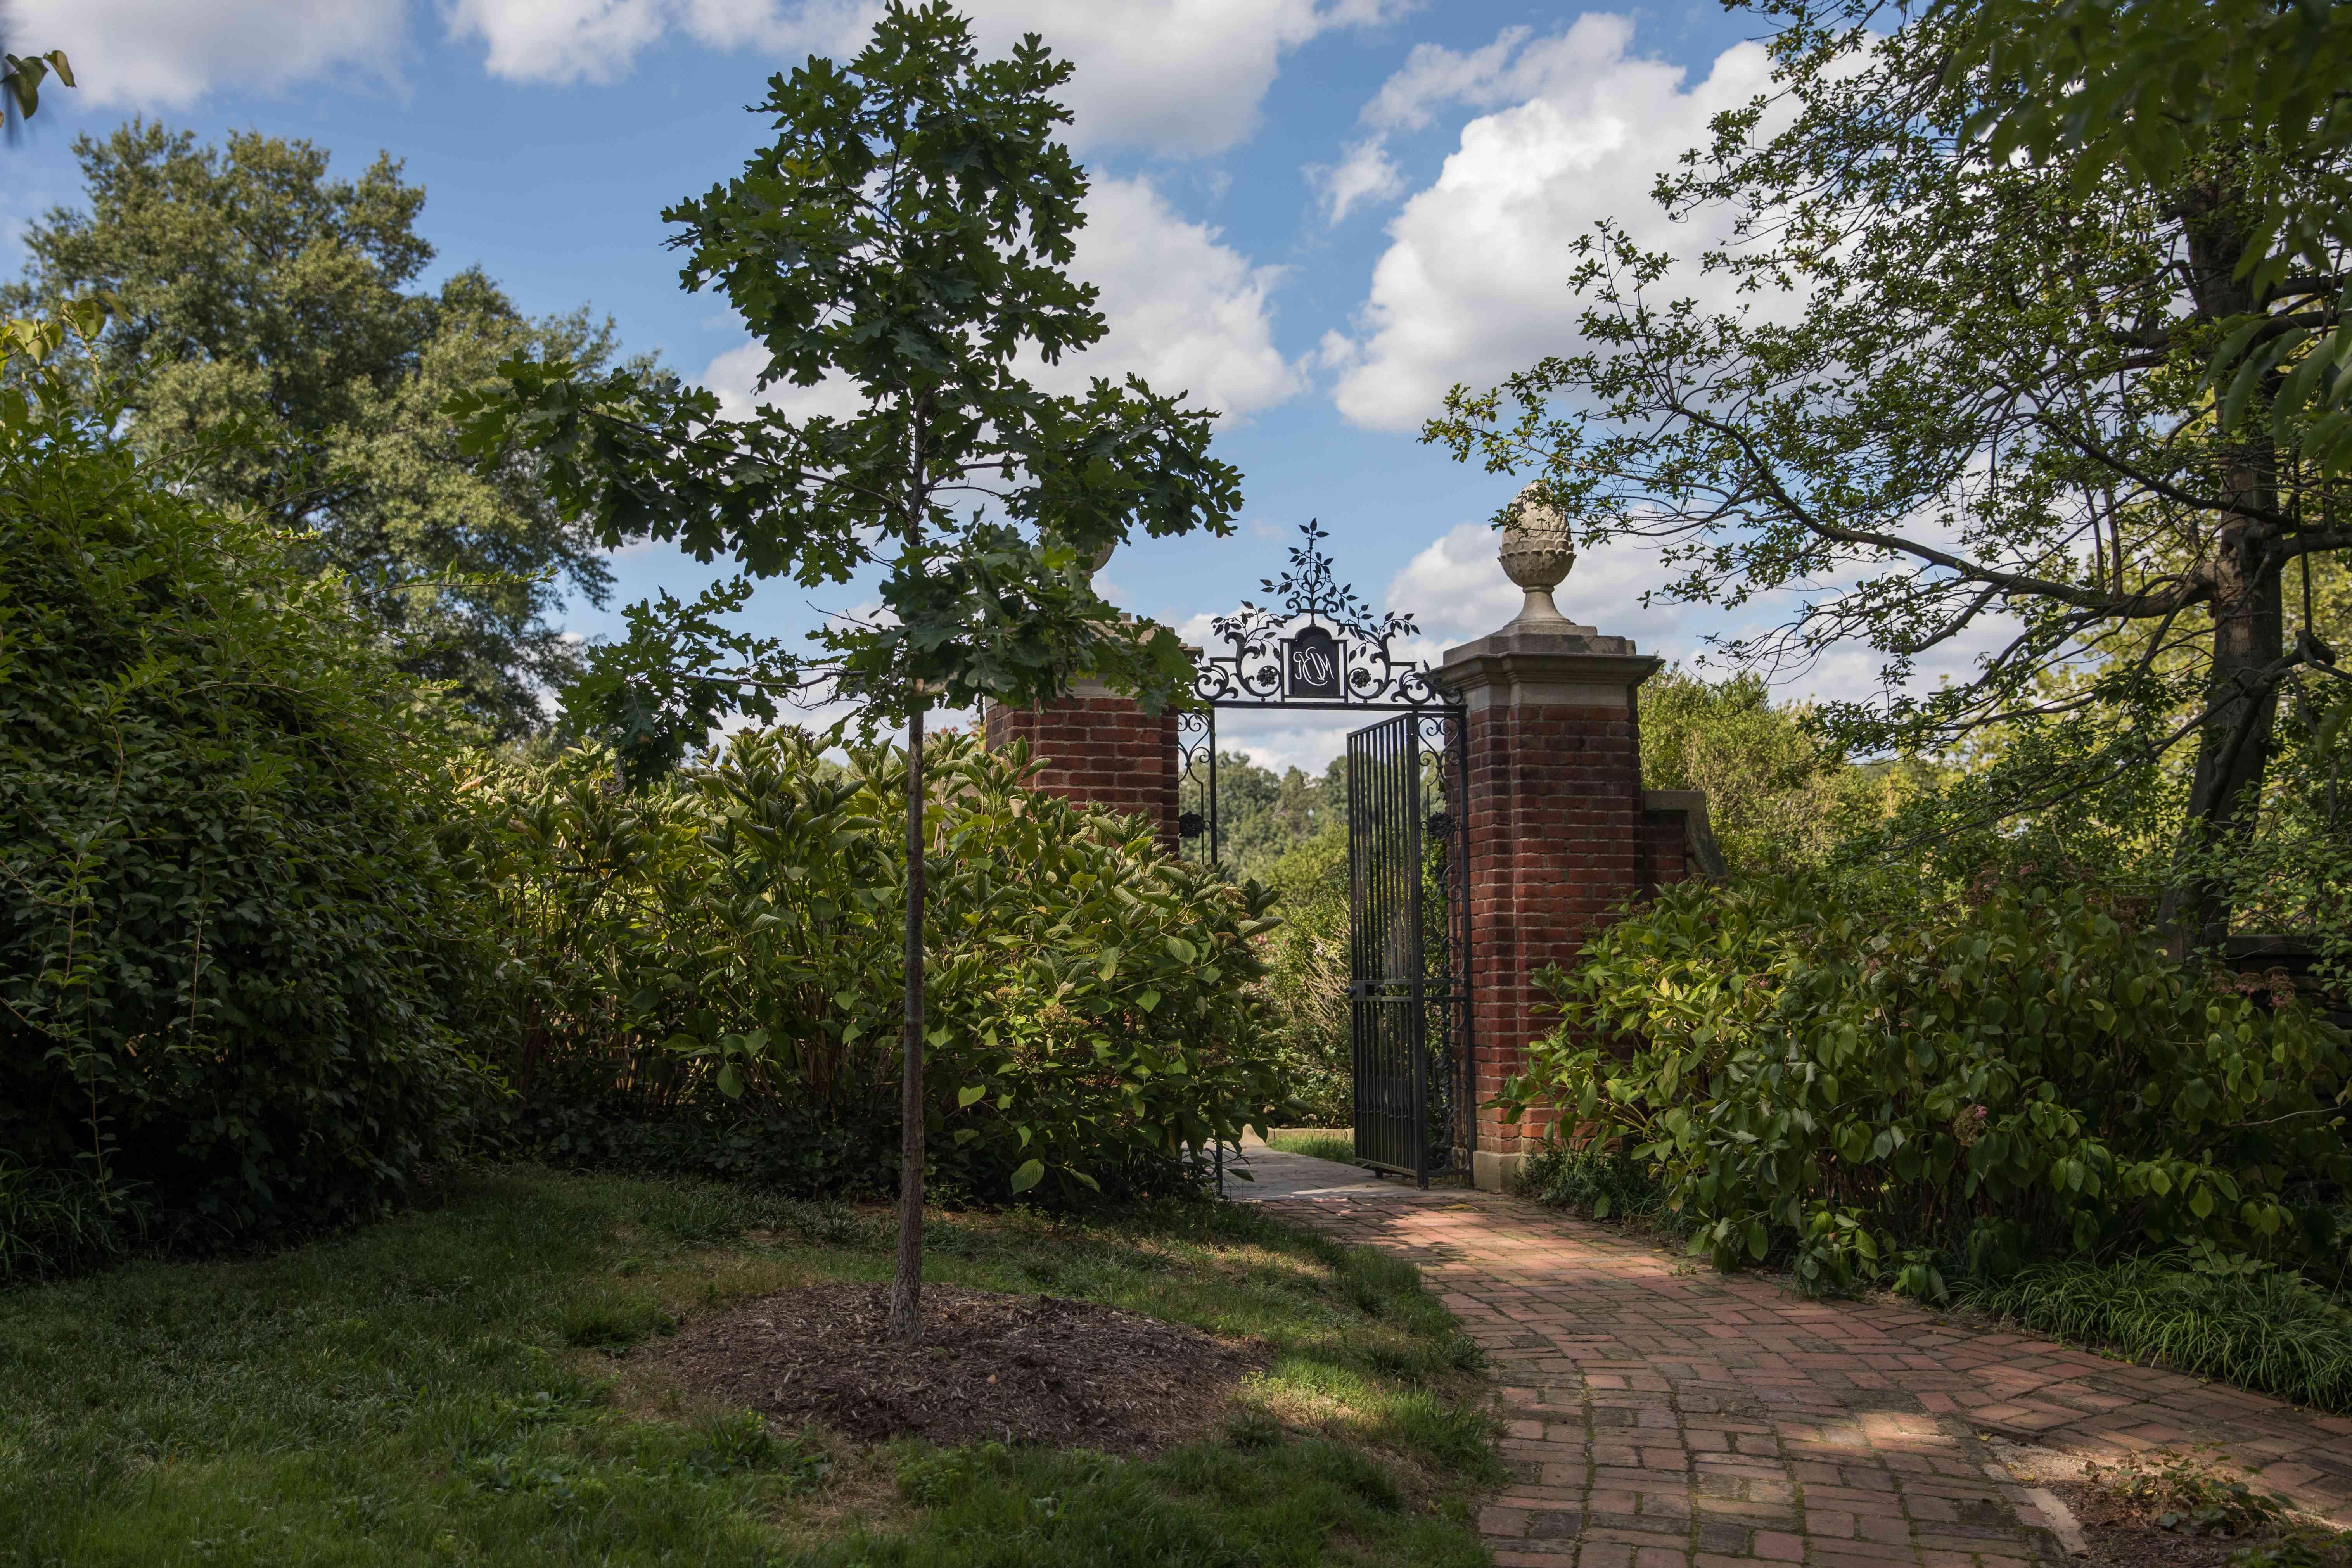 Gates to Dumbarton Oaks